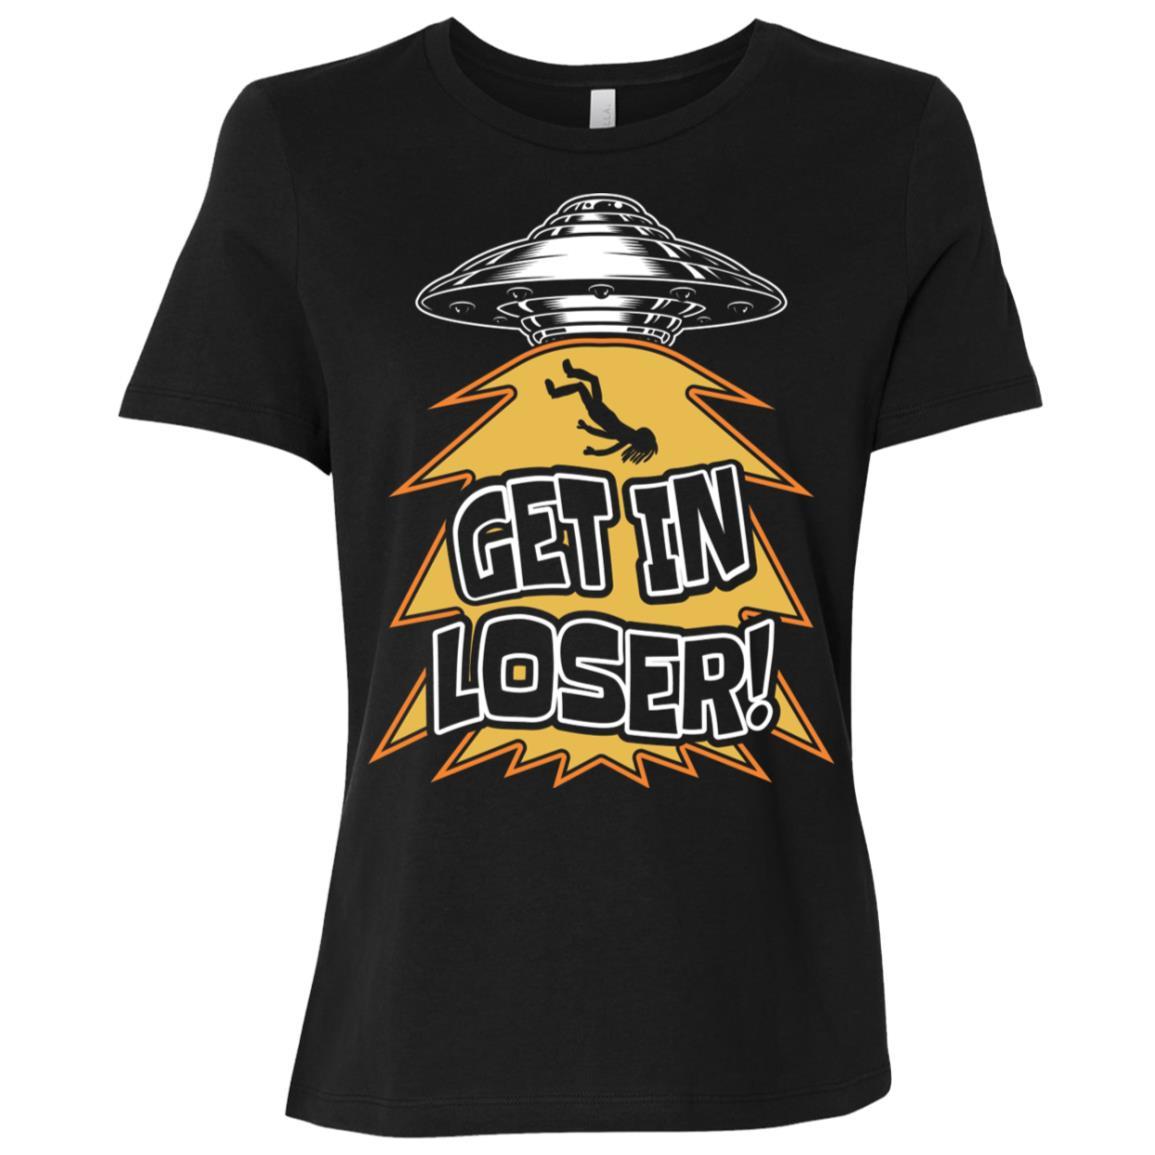 Alien Ufo Believer Funny Abduction -2 Women Short Sleeve T-Shirt